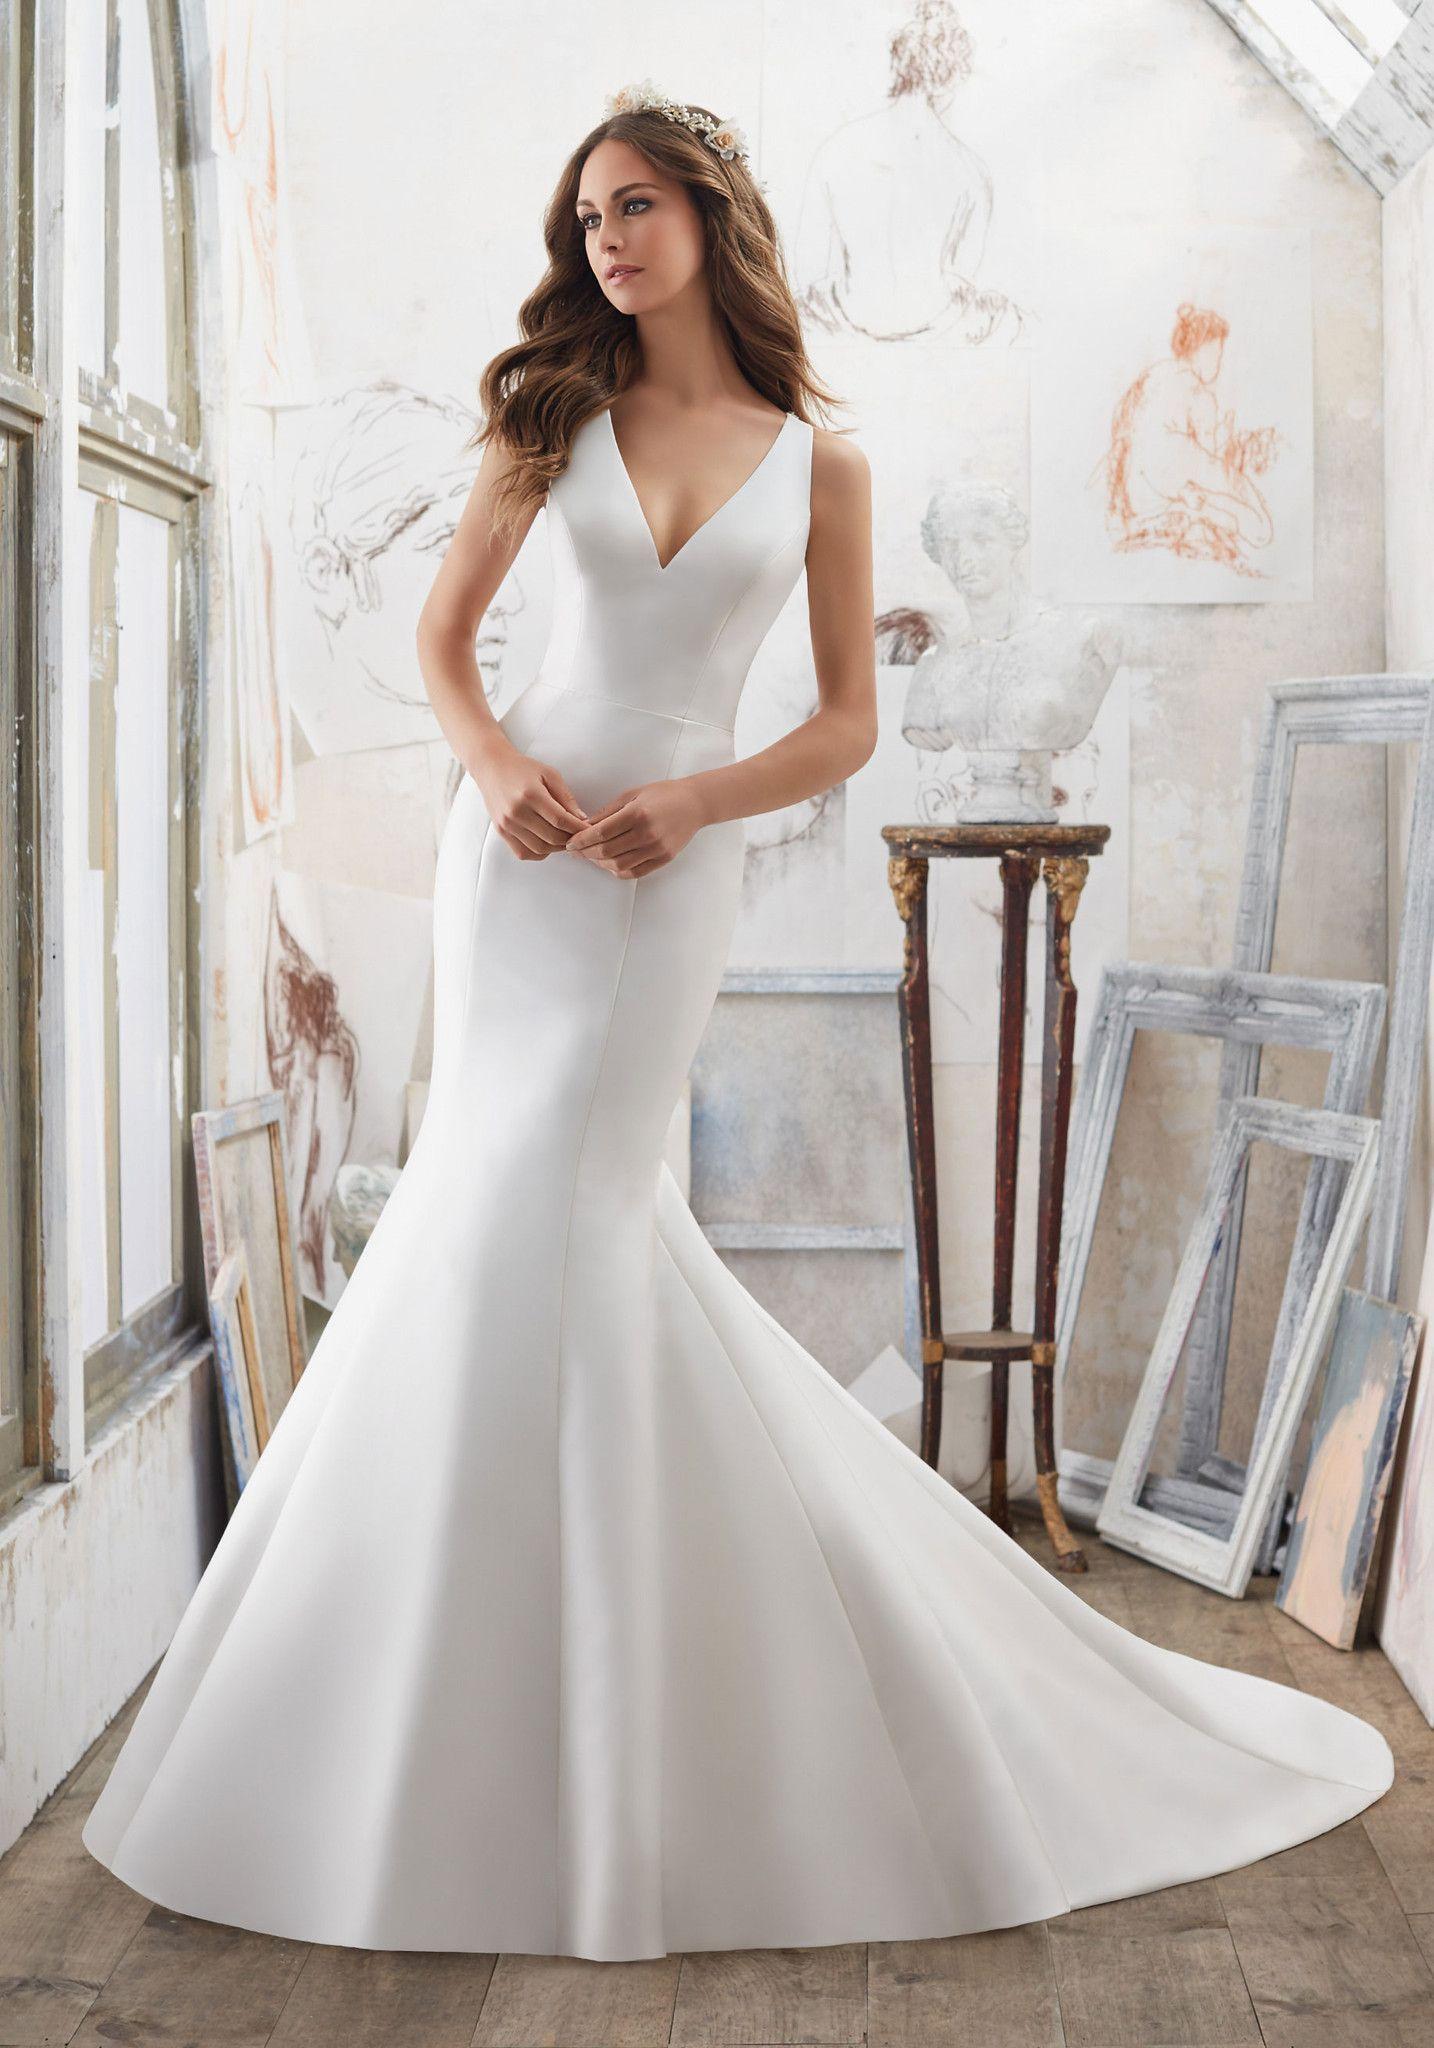 Simple elegant wedding dress designers  Blu  Marlena    All Dressed Up Bridal Gown